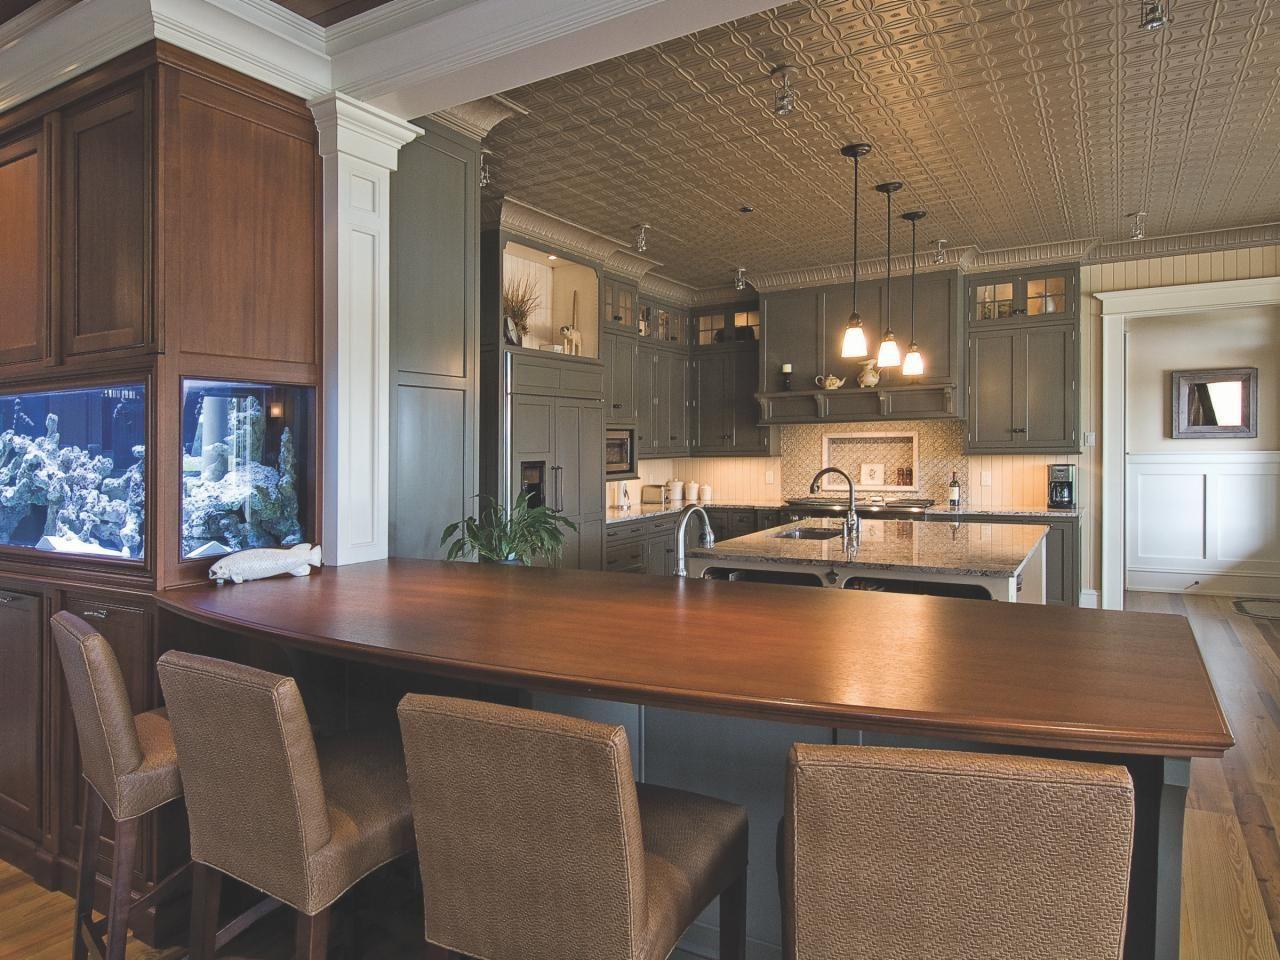 Victorian Kitchens   Kitchen Designs - Choose Kitchen Layouts & Remodeling Materials   HGTV